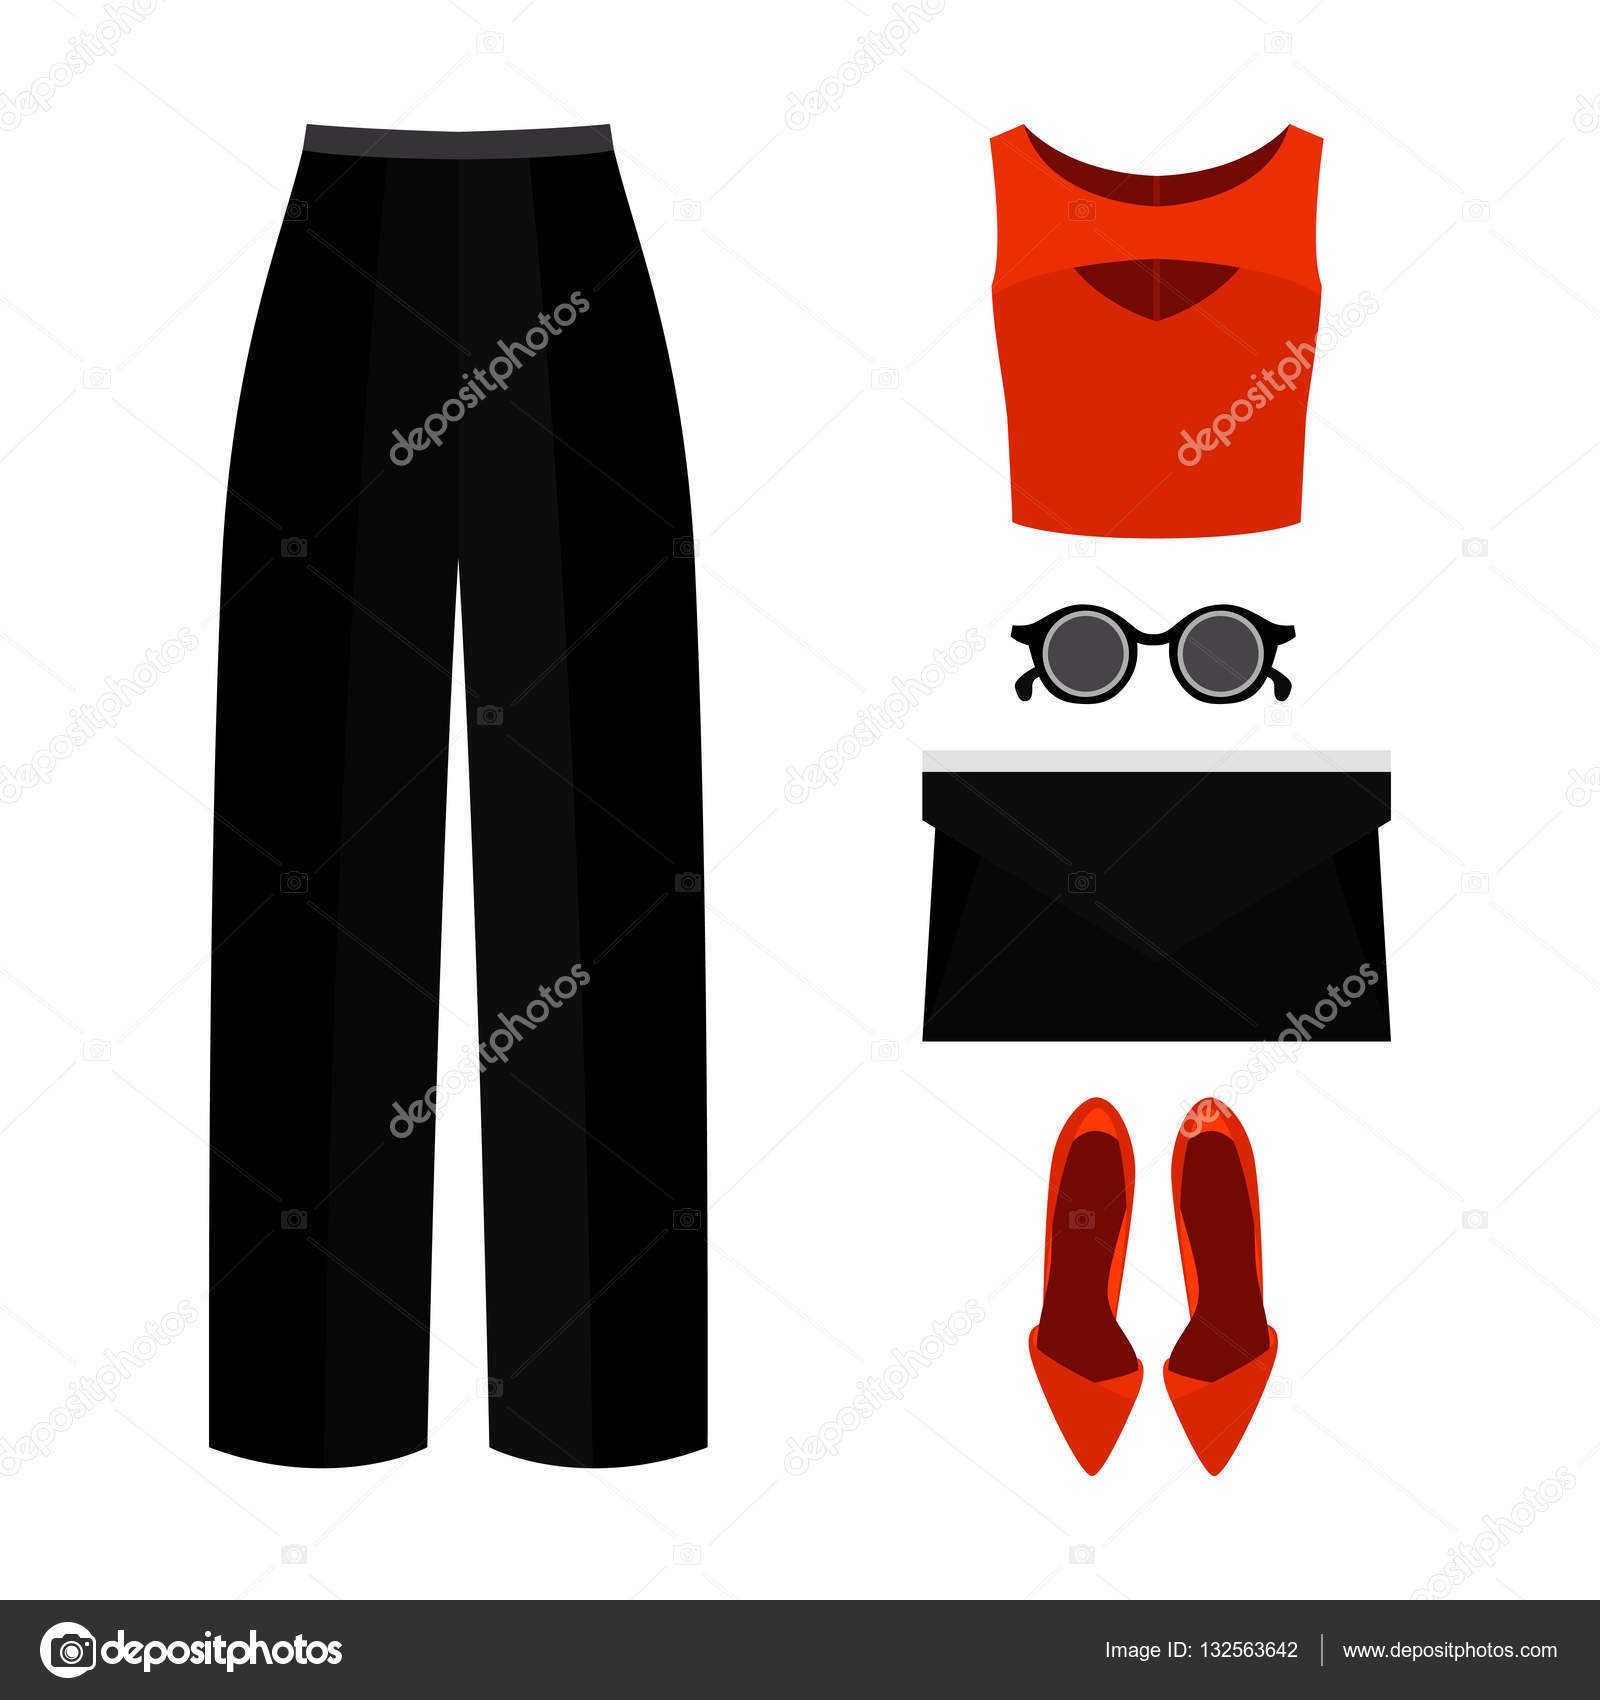 c68112505411 Μοντέρνα γυναικεία ρούχα